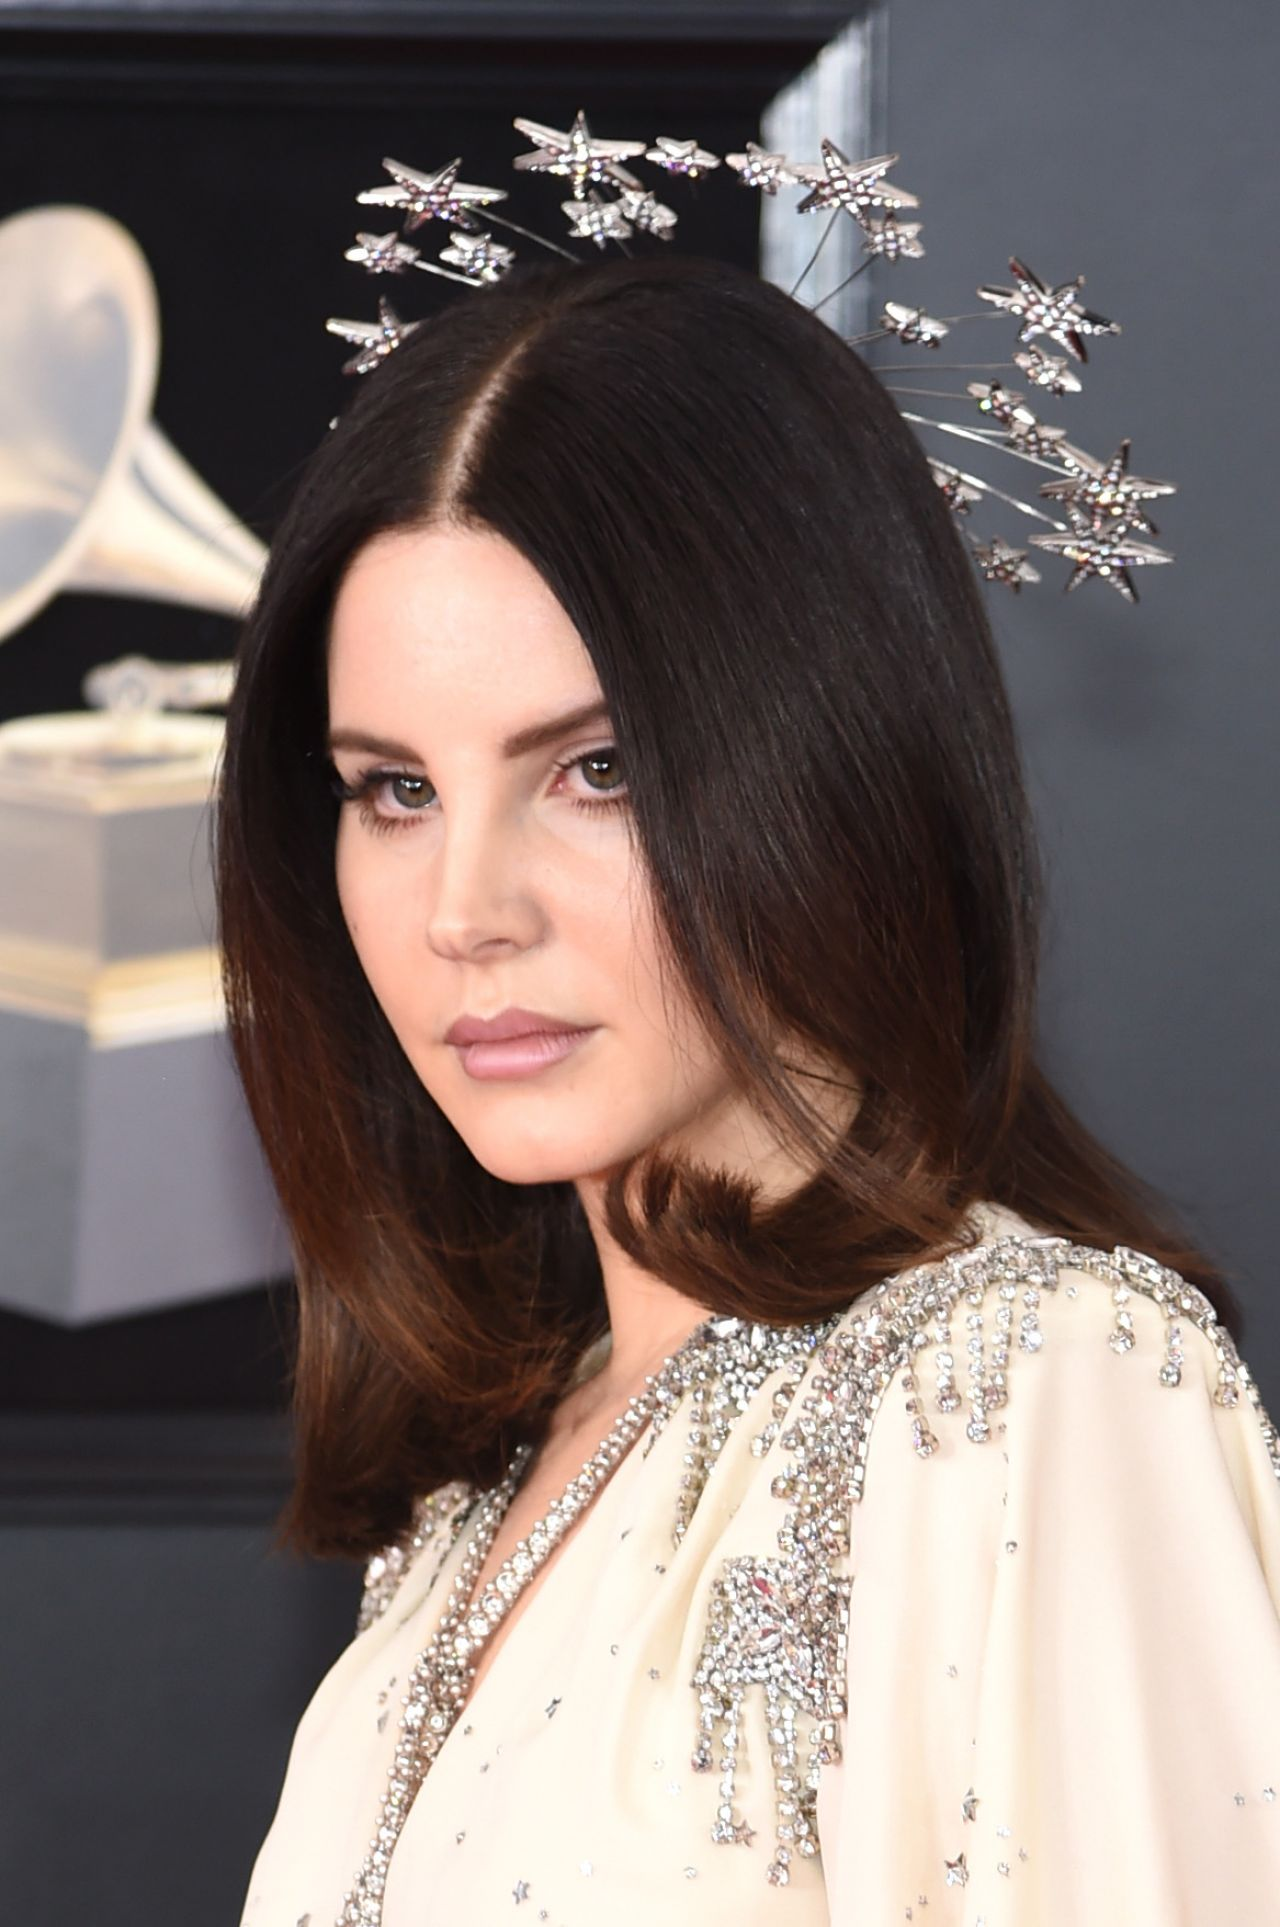 Lana Del Rey By Chris Nicholls For Fashion Magazine: 2018 Grammy Awards In New York